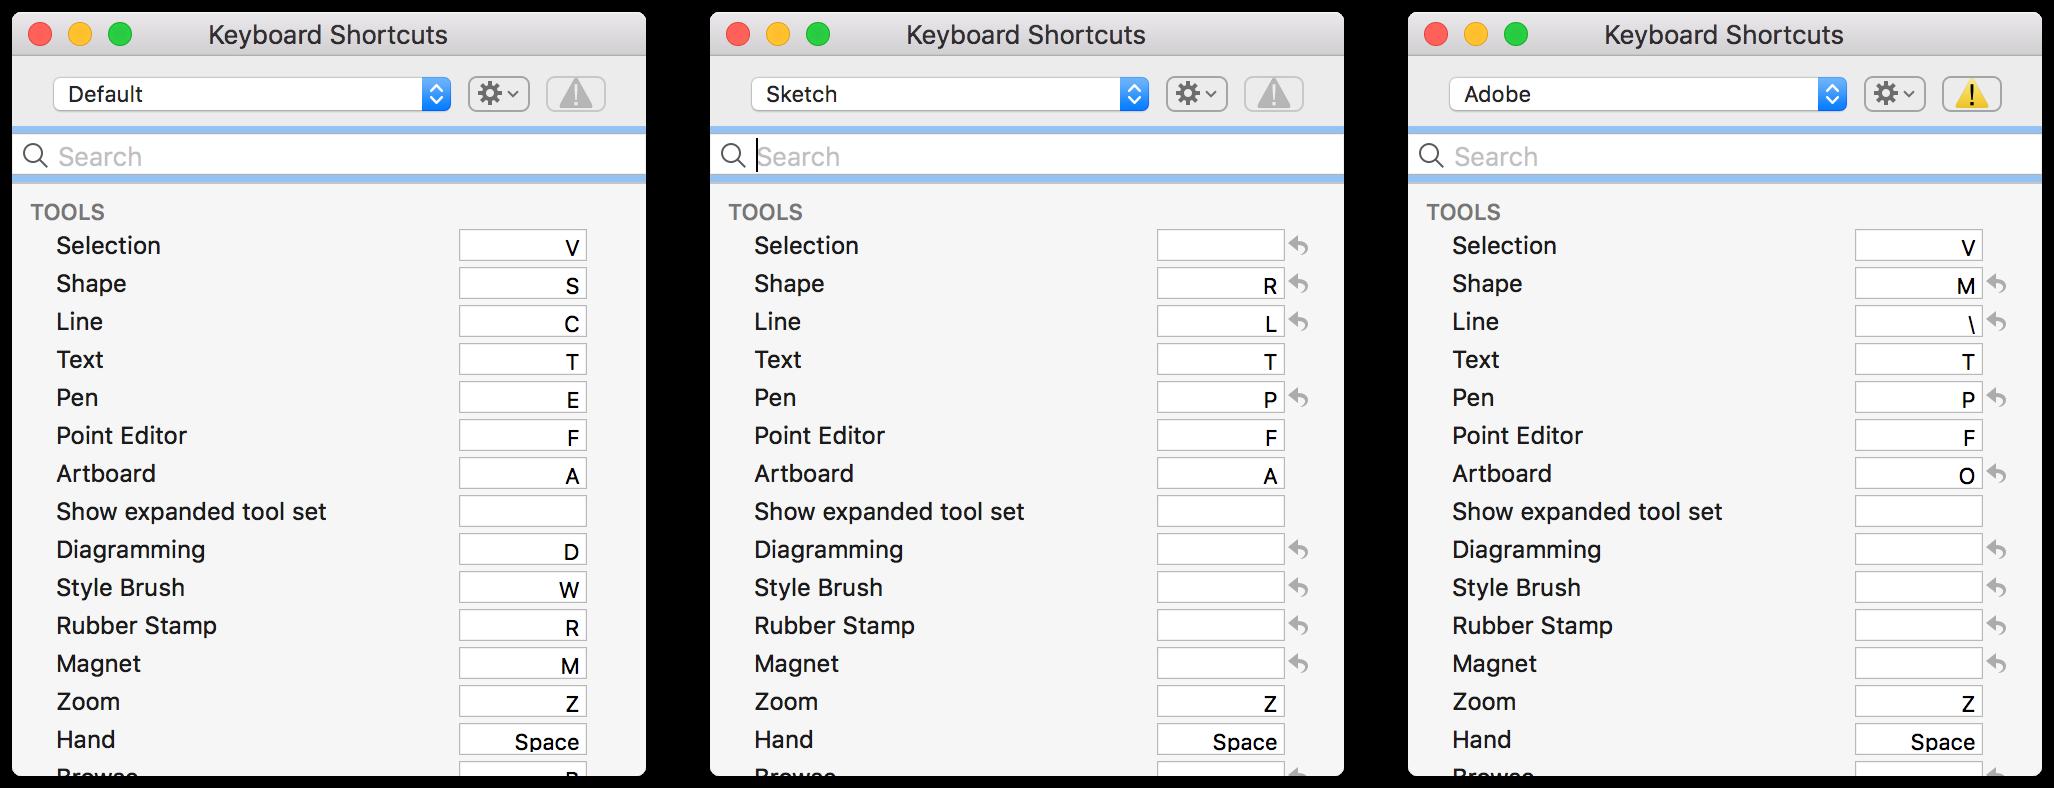 Built-in Keyboard Shortcut Sets in OmniGraffle 7: OmniGraffle, Adobe, Sketch.